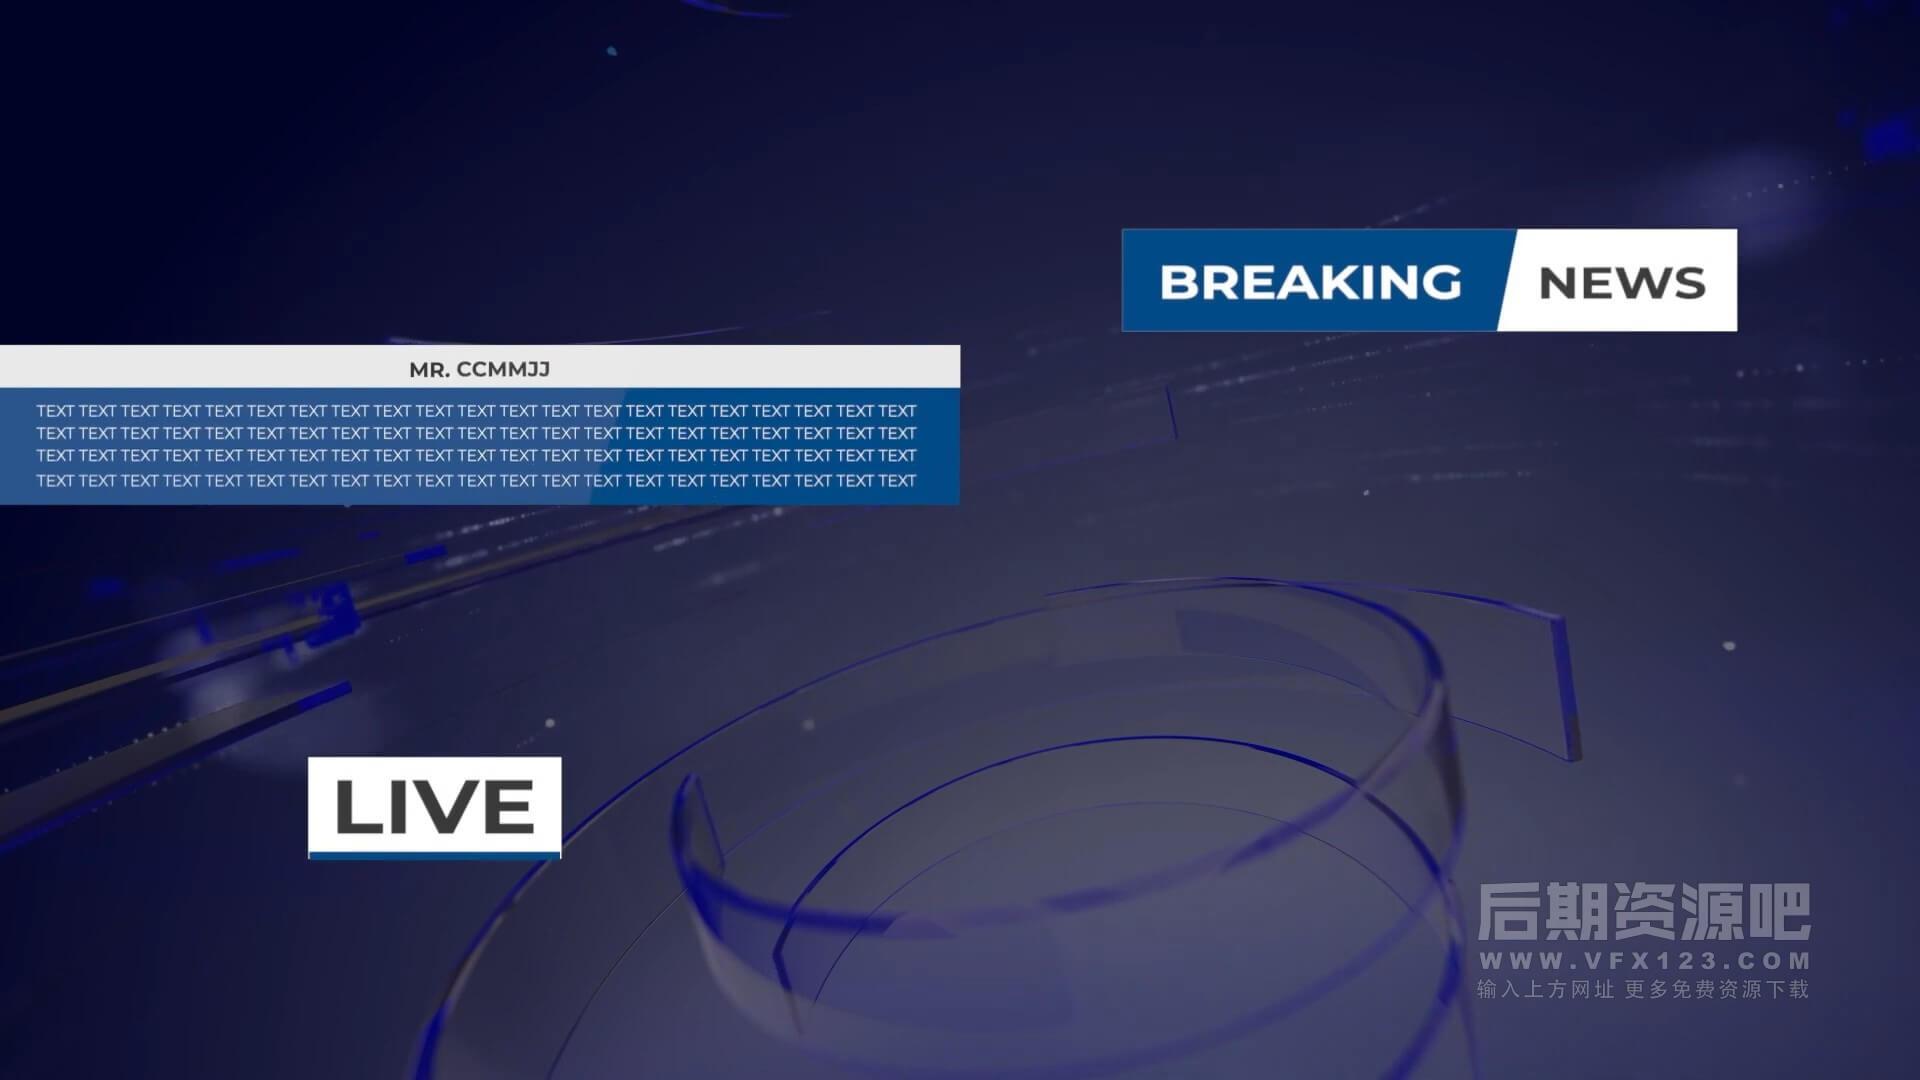 fcpx插件 实用新闻News栏目包装素材包 News BroadCast Vol.1